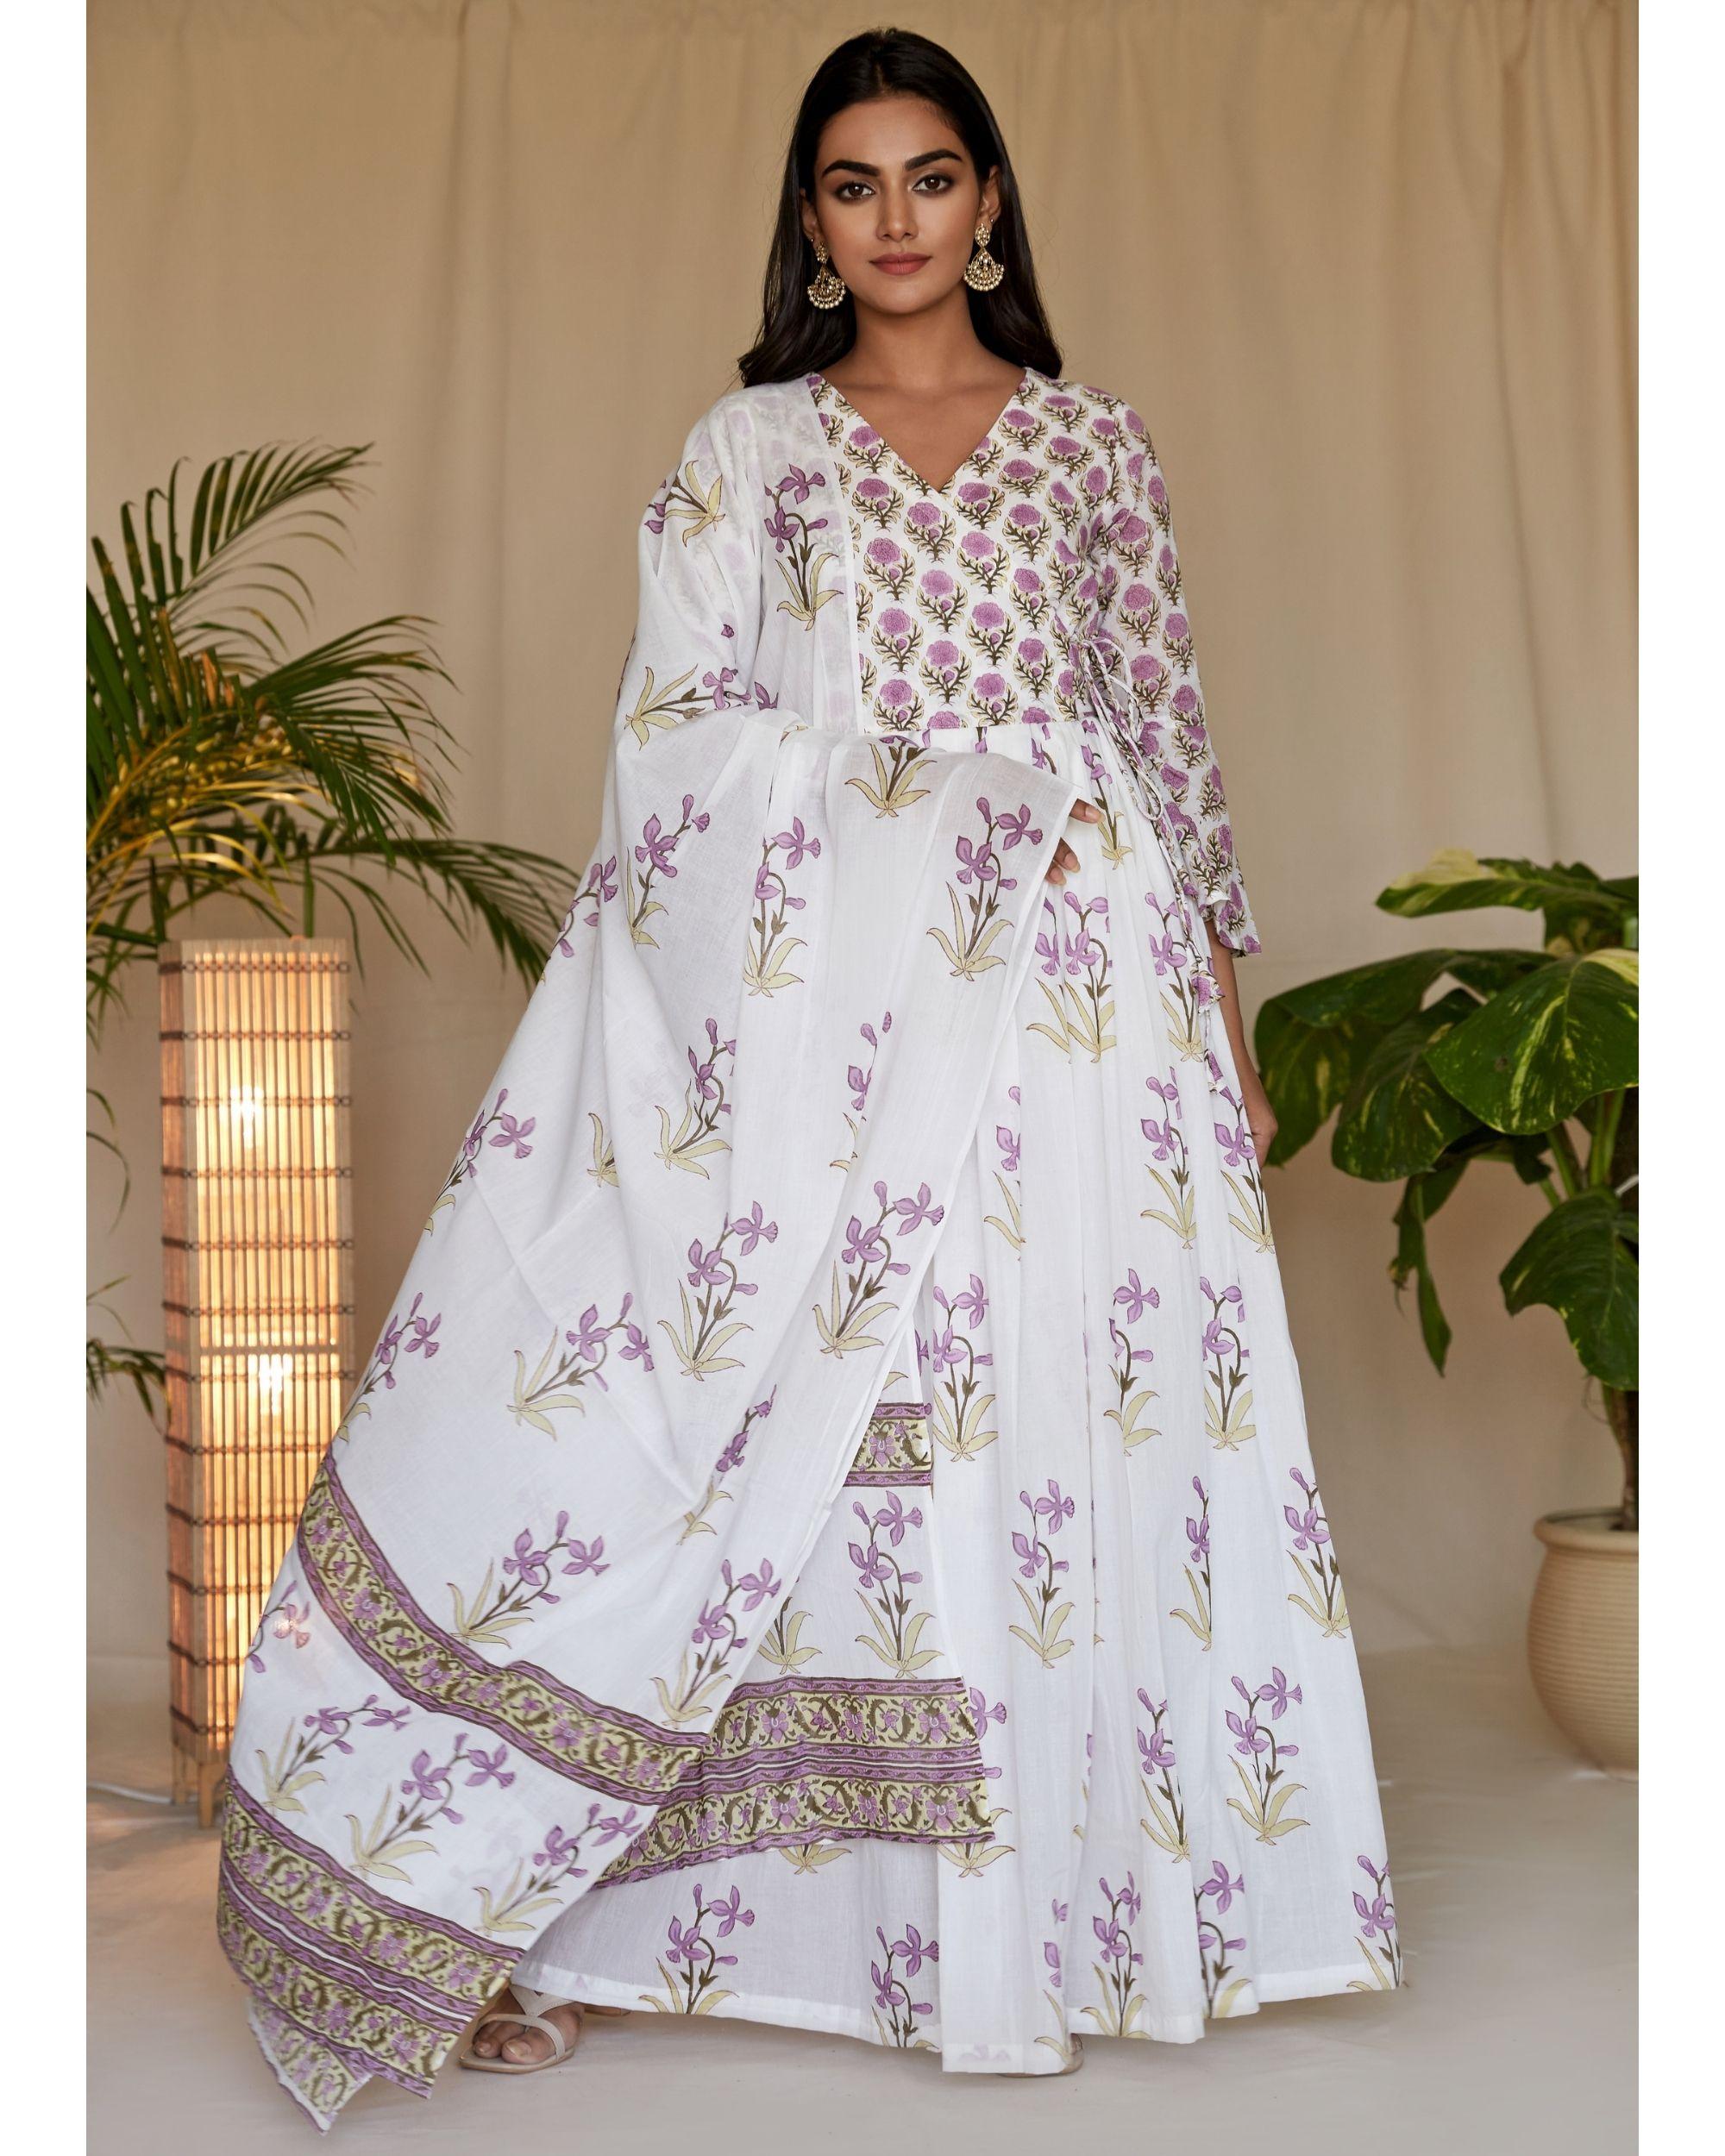 Lilac lily block printed angrakha dress with dupatta - Set Of Two